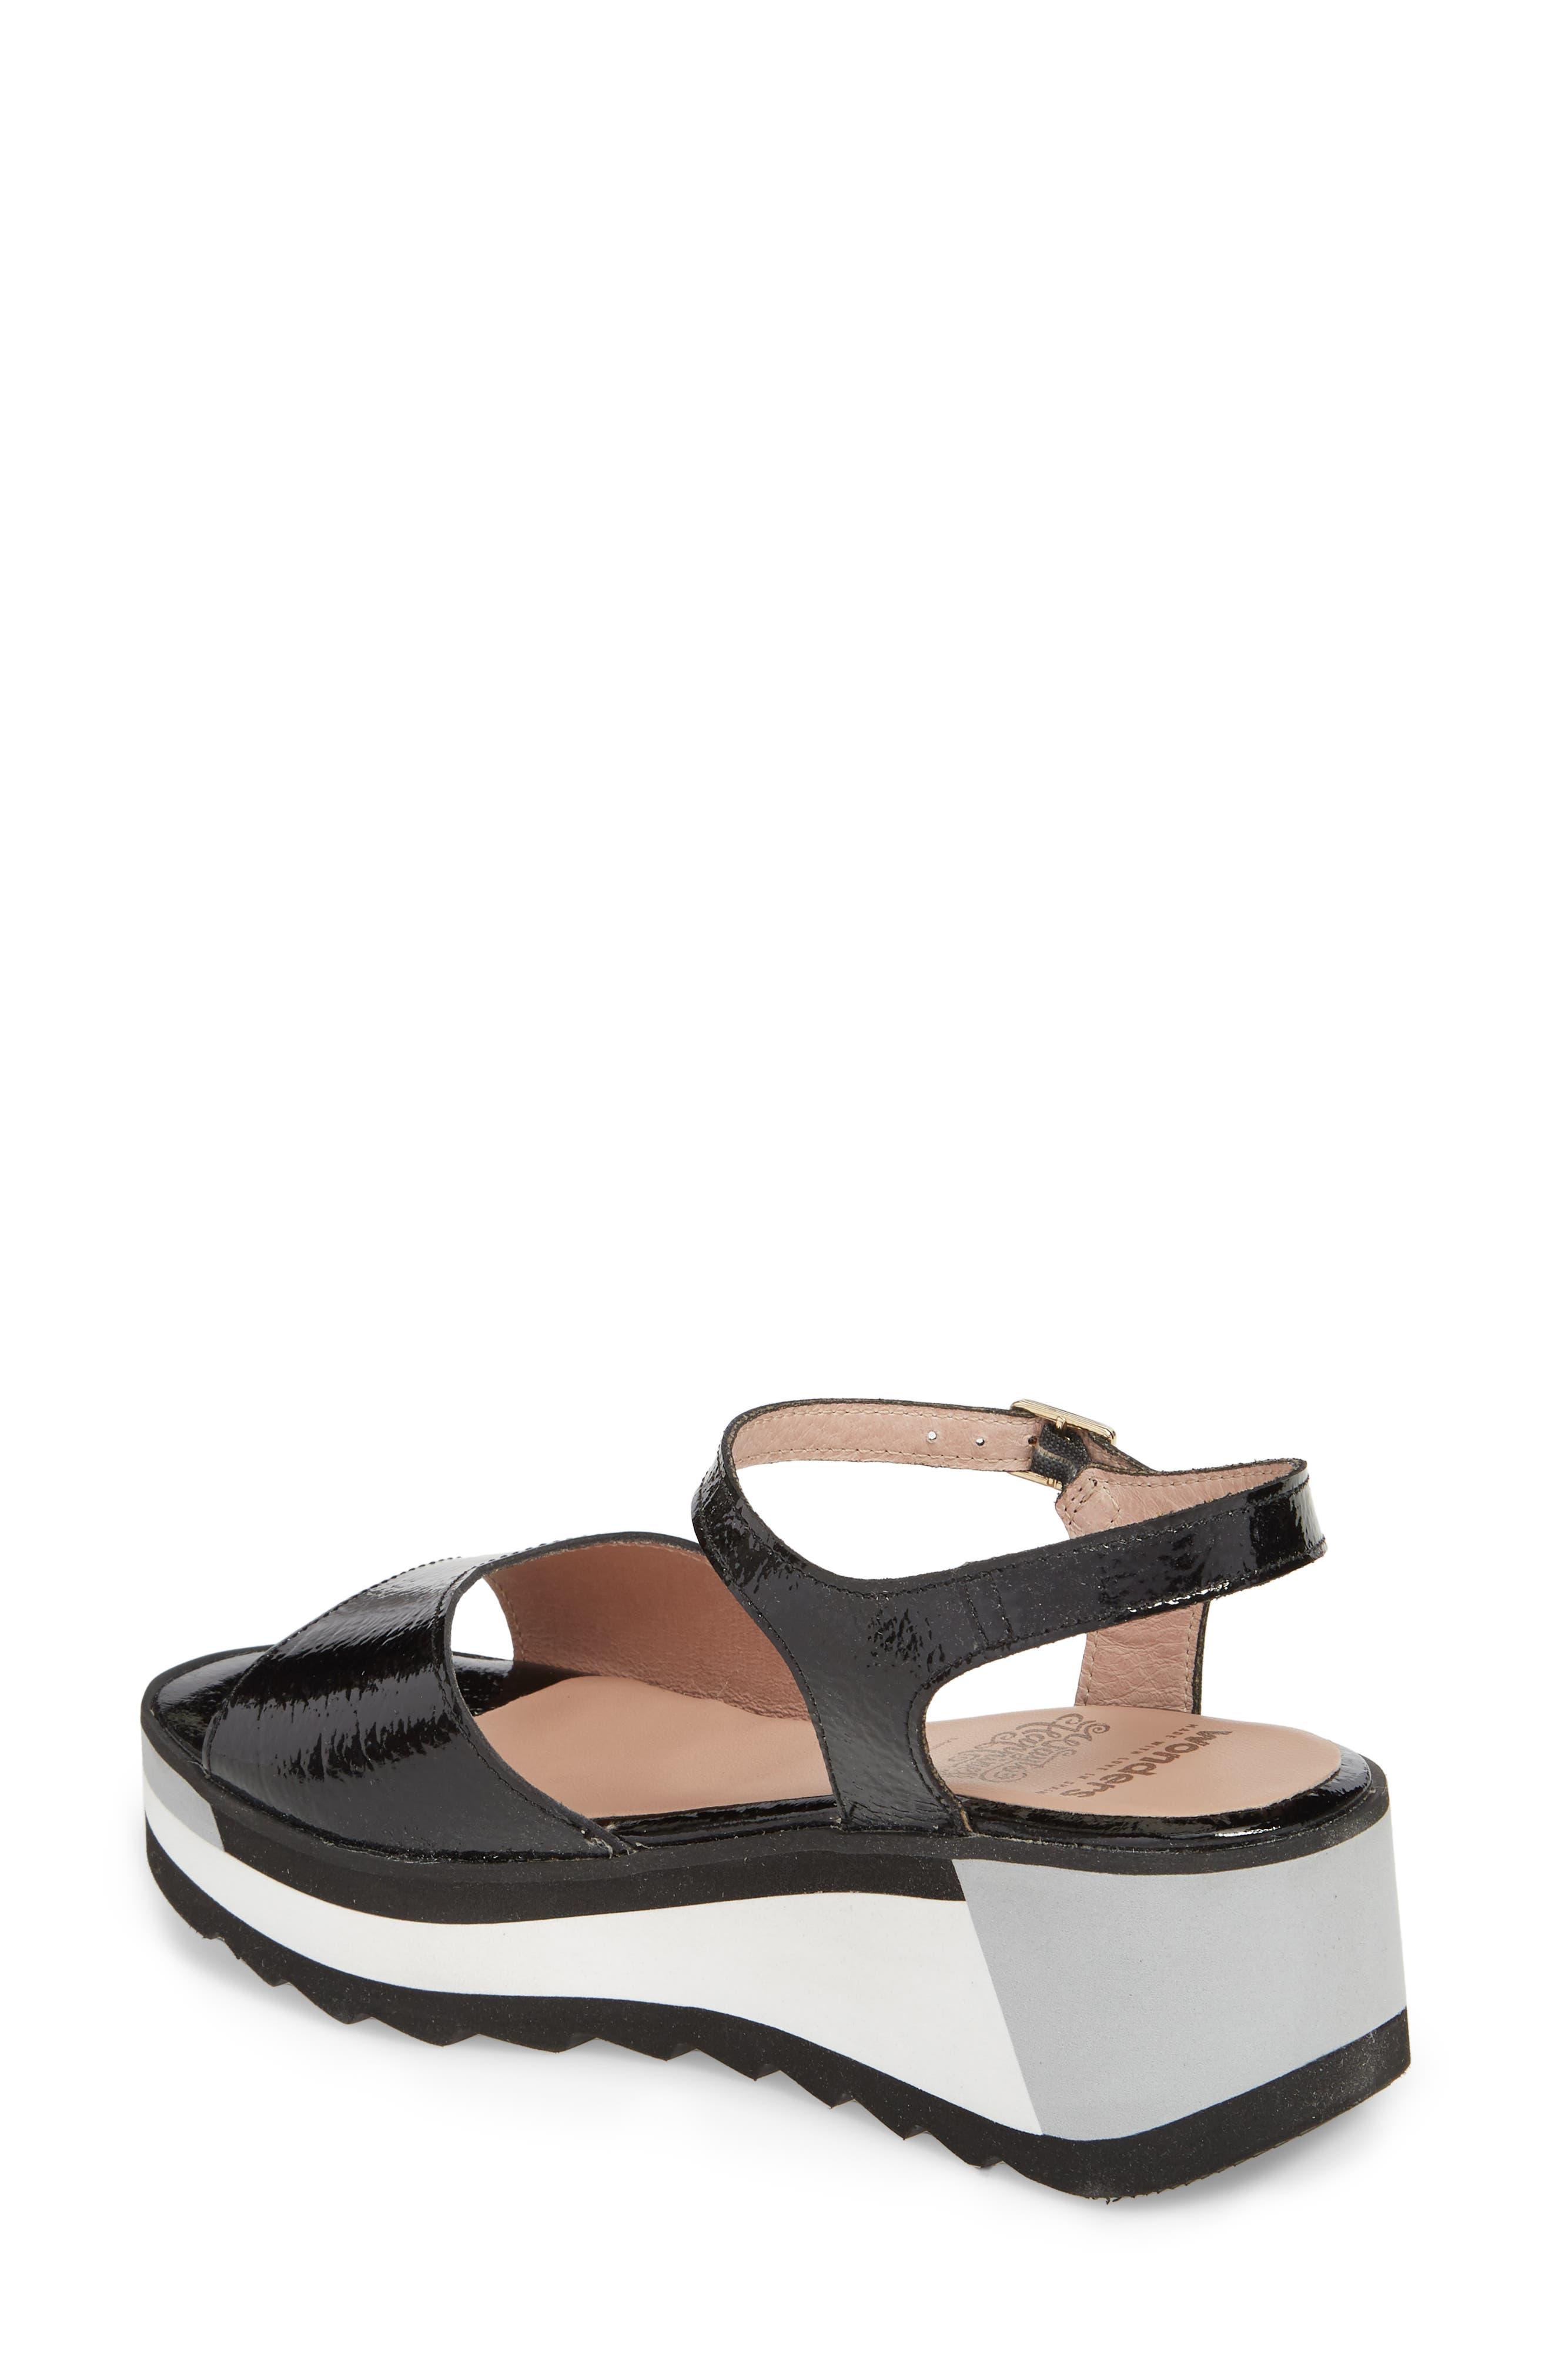 D-7810 Sandal,                             Alternate thumbnail 2, color,                             Black Patent Leather